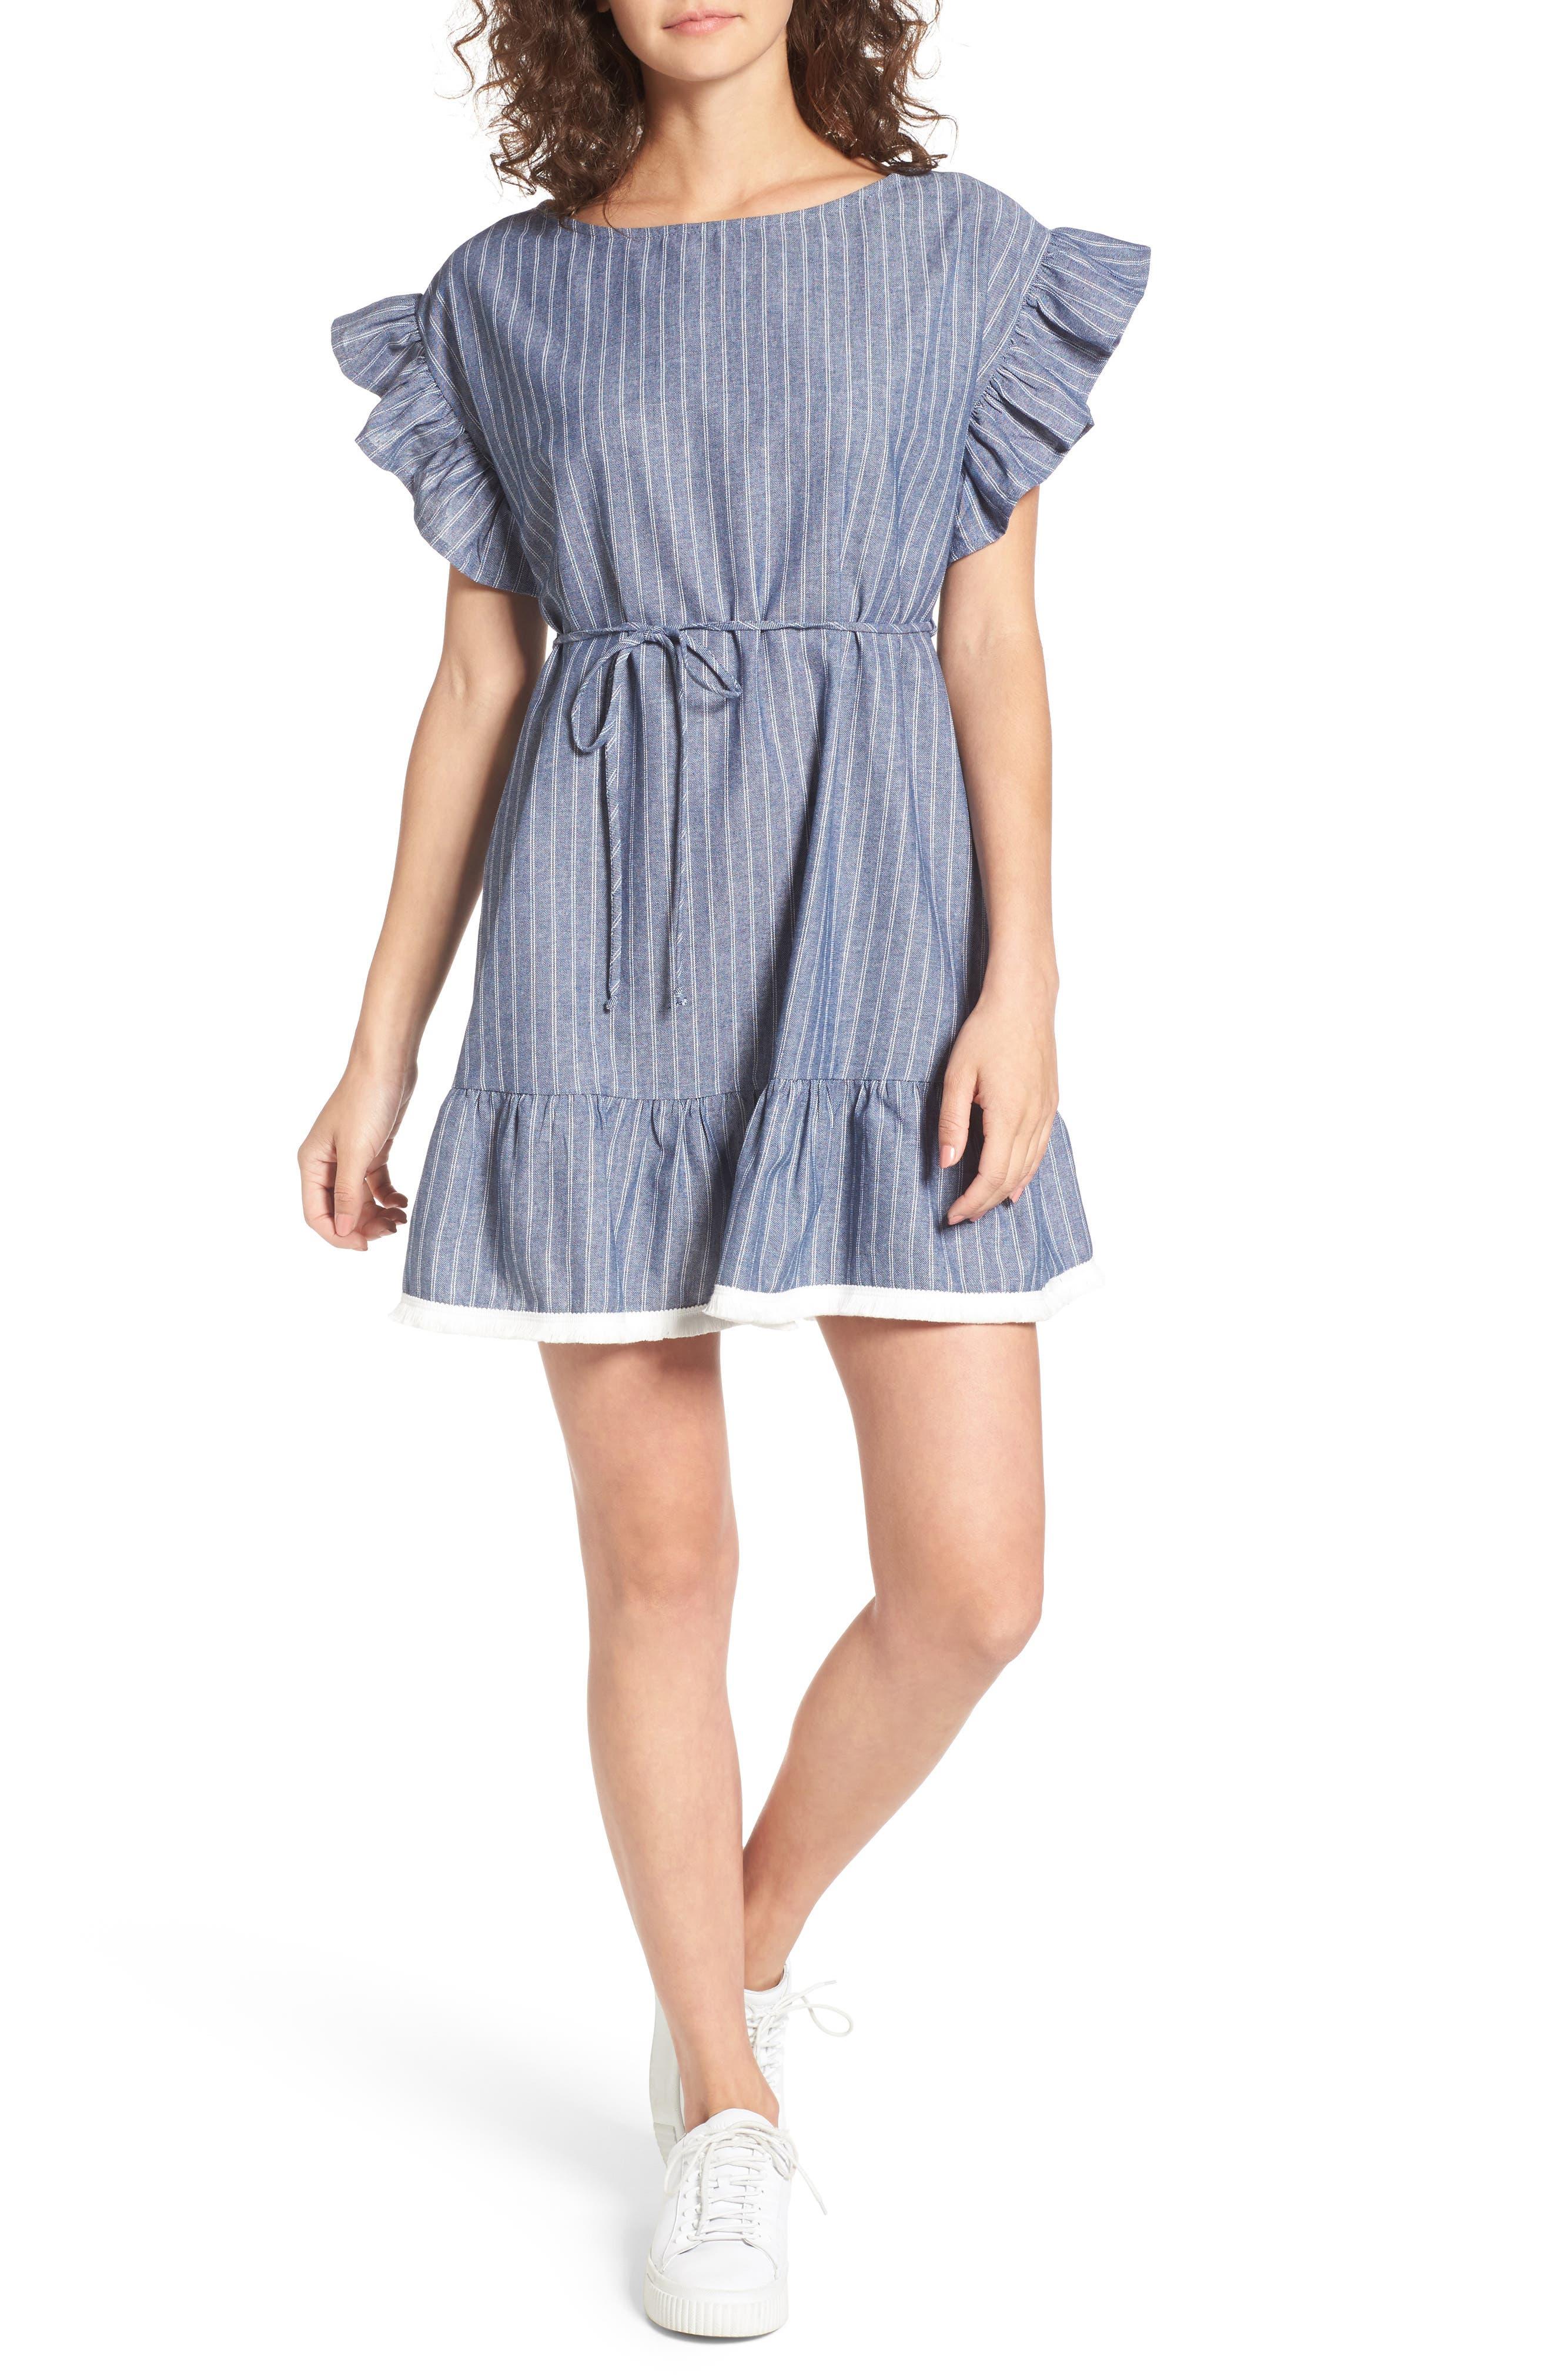 Alternate Image 1 Selected - BP. Ruffle Trim Stripe Cotton Shift Dress